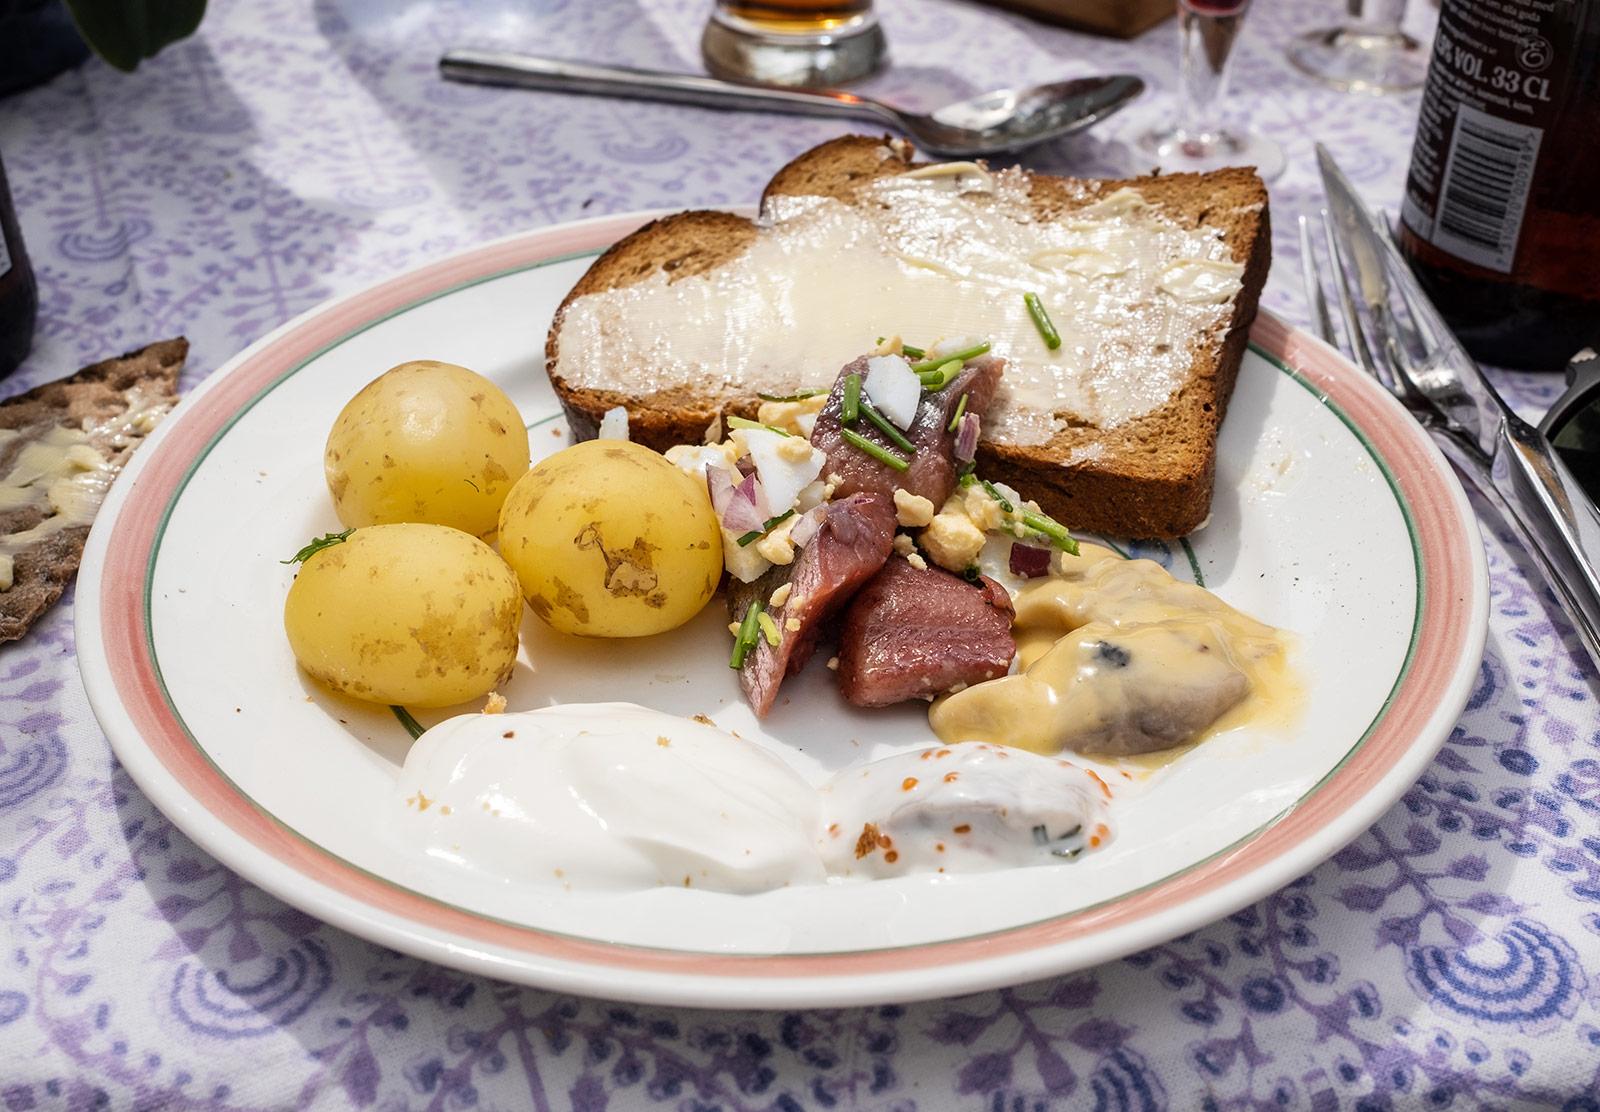 Potatoes, bread and herring